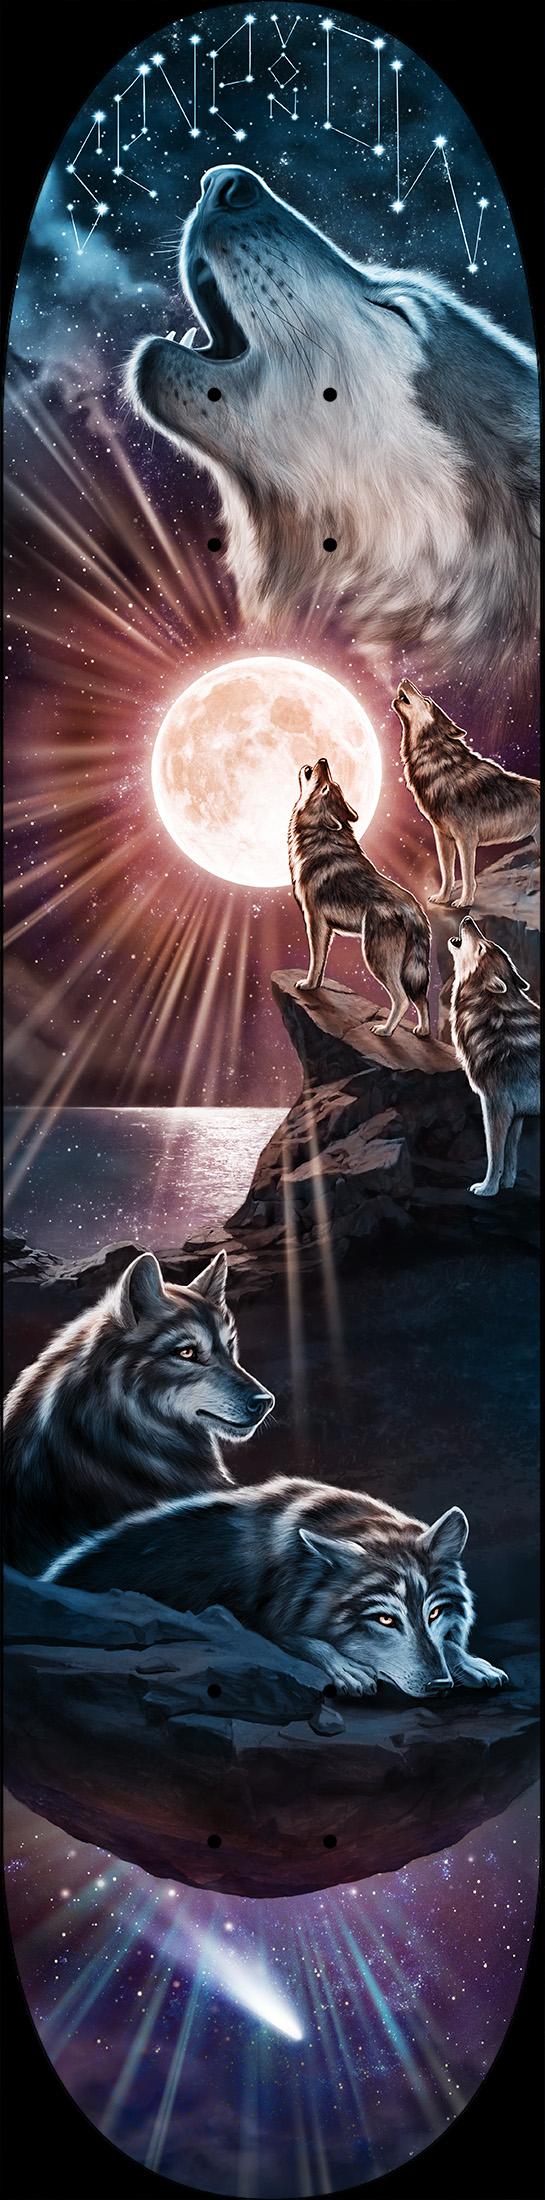 patrickgraf_sevevonow_wolfboard.jpg